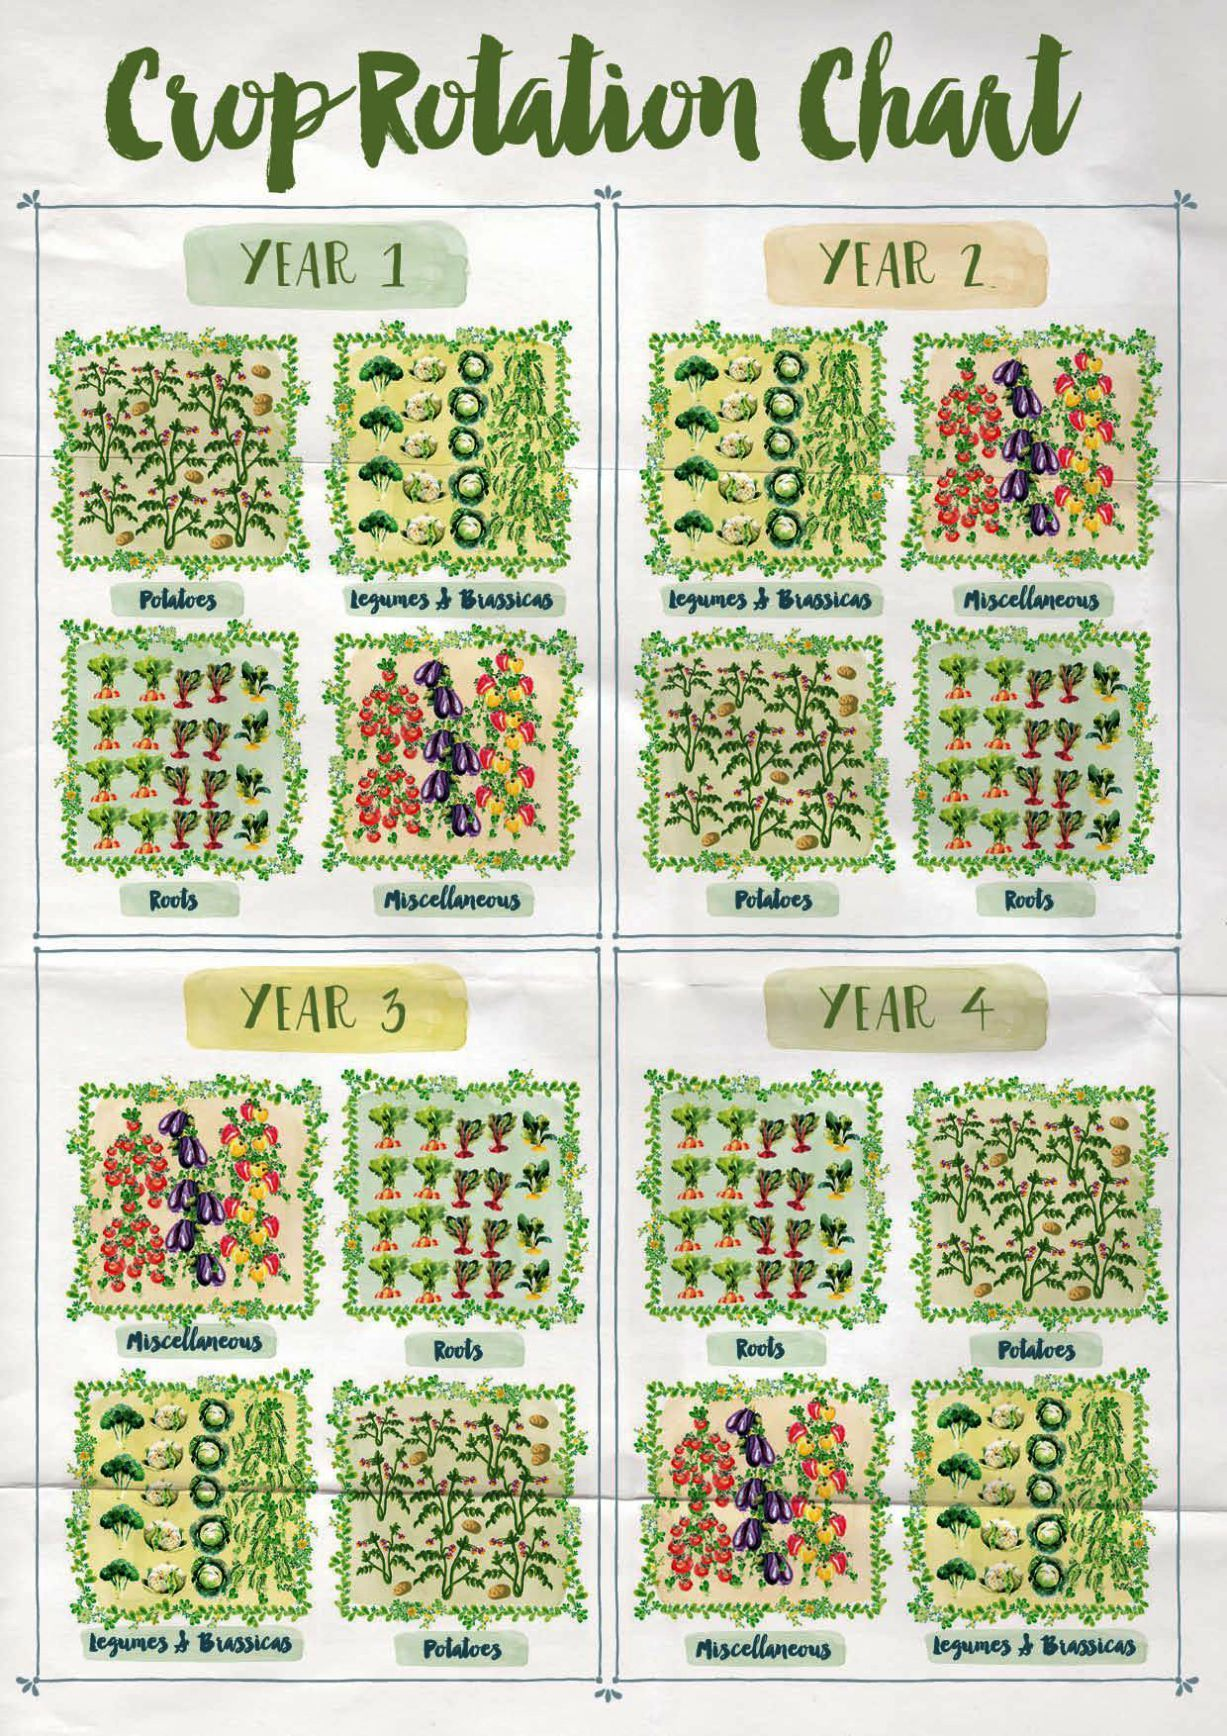 Gardening Tools Crossword Clue Before Gardening Gifts For Him Uk Save Gardening Services Darwin Vegetable Garden Design Organic Vegetable Garden Garden Types